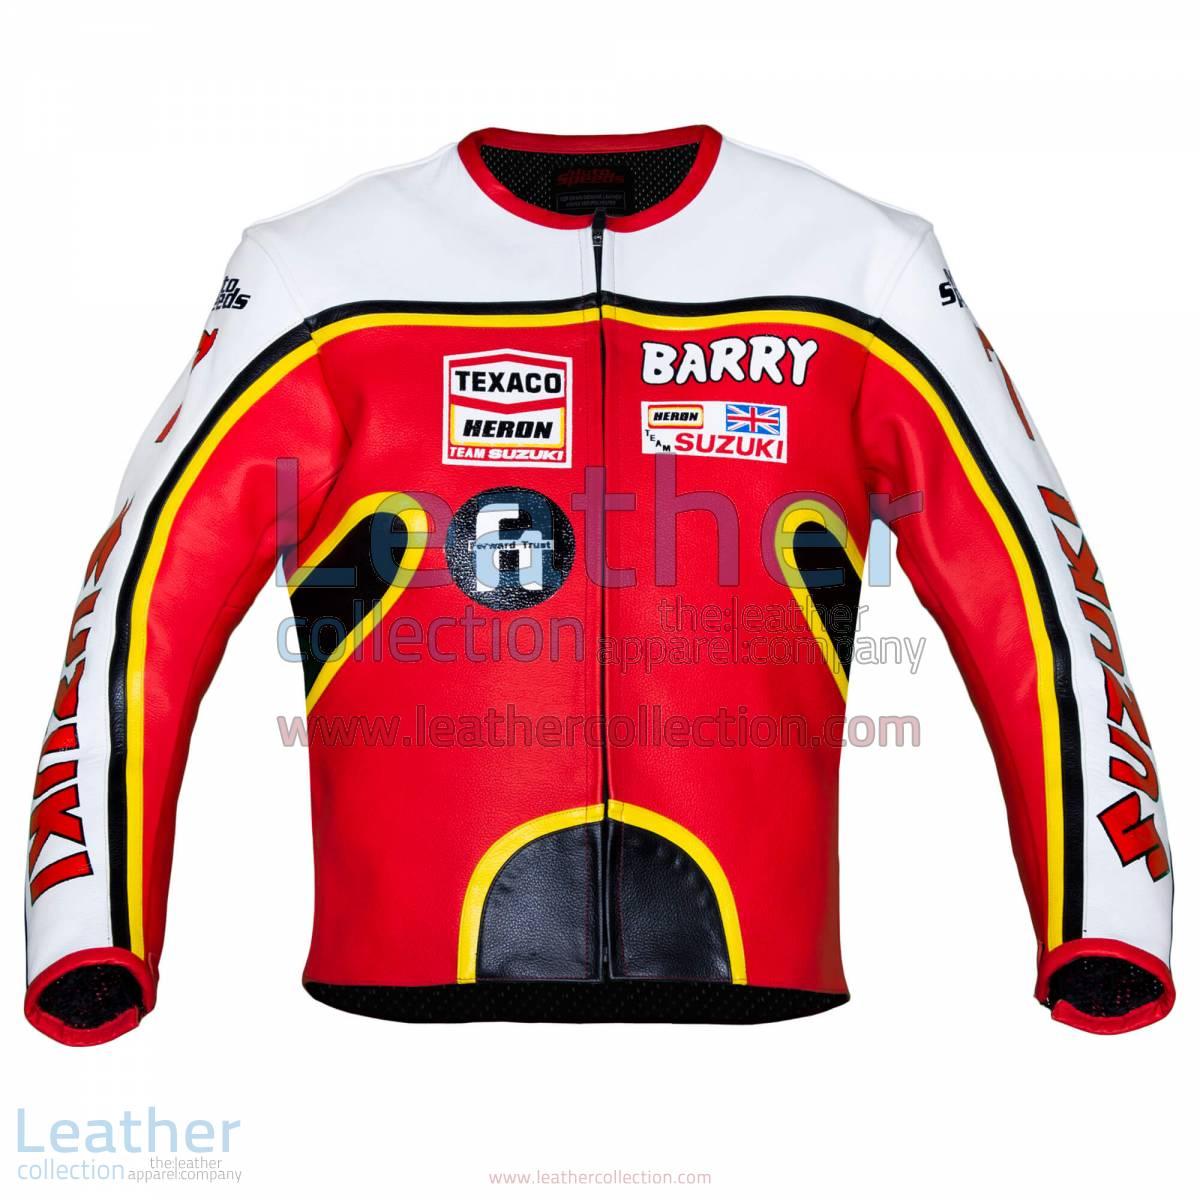 Barry Sheene Suzuki GP 1976 Leather Jacket